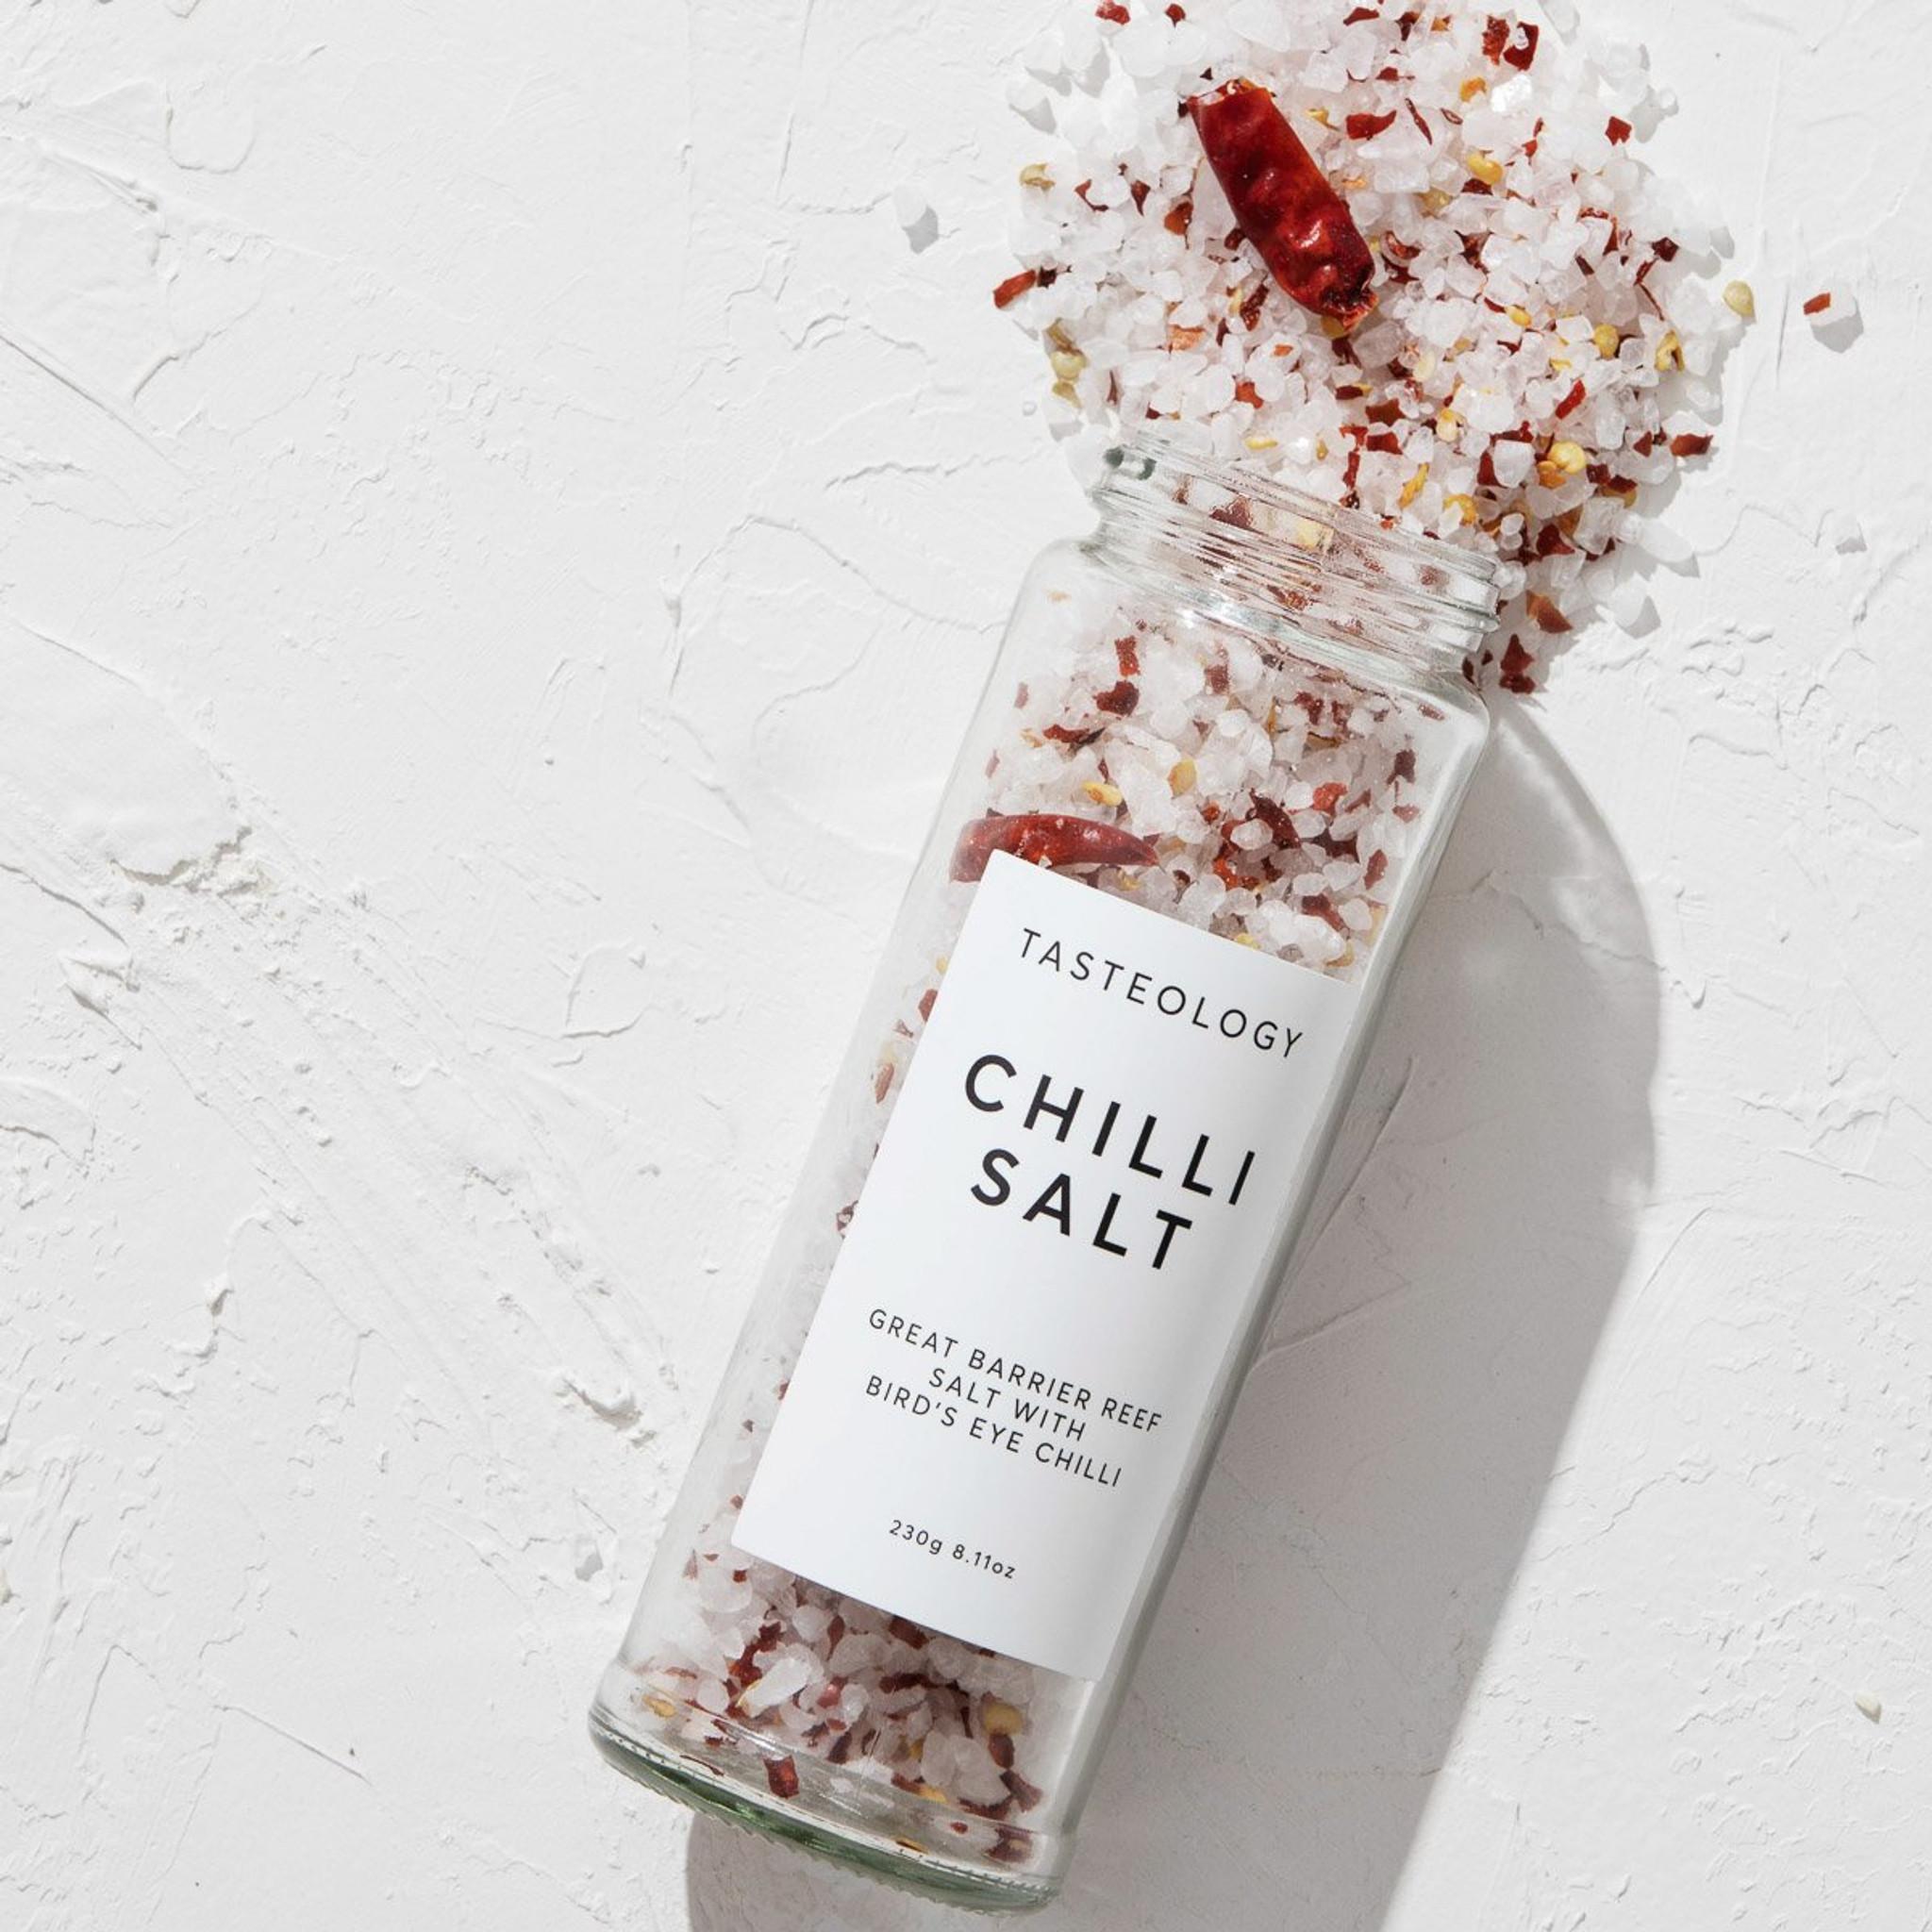 Tasteology Great Barrier Reef Chilli Salt